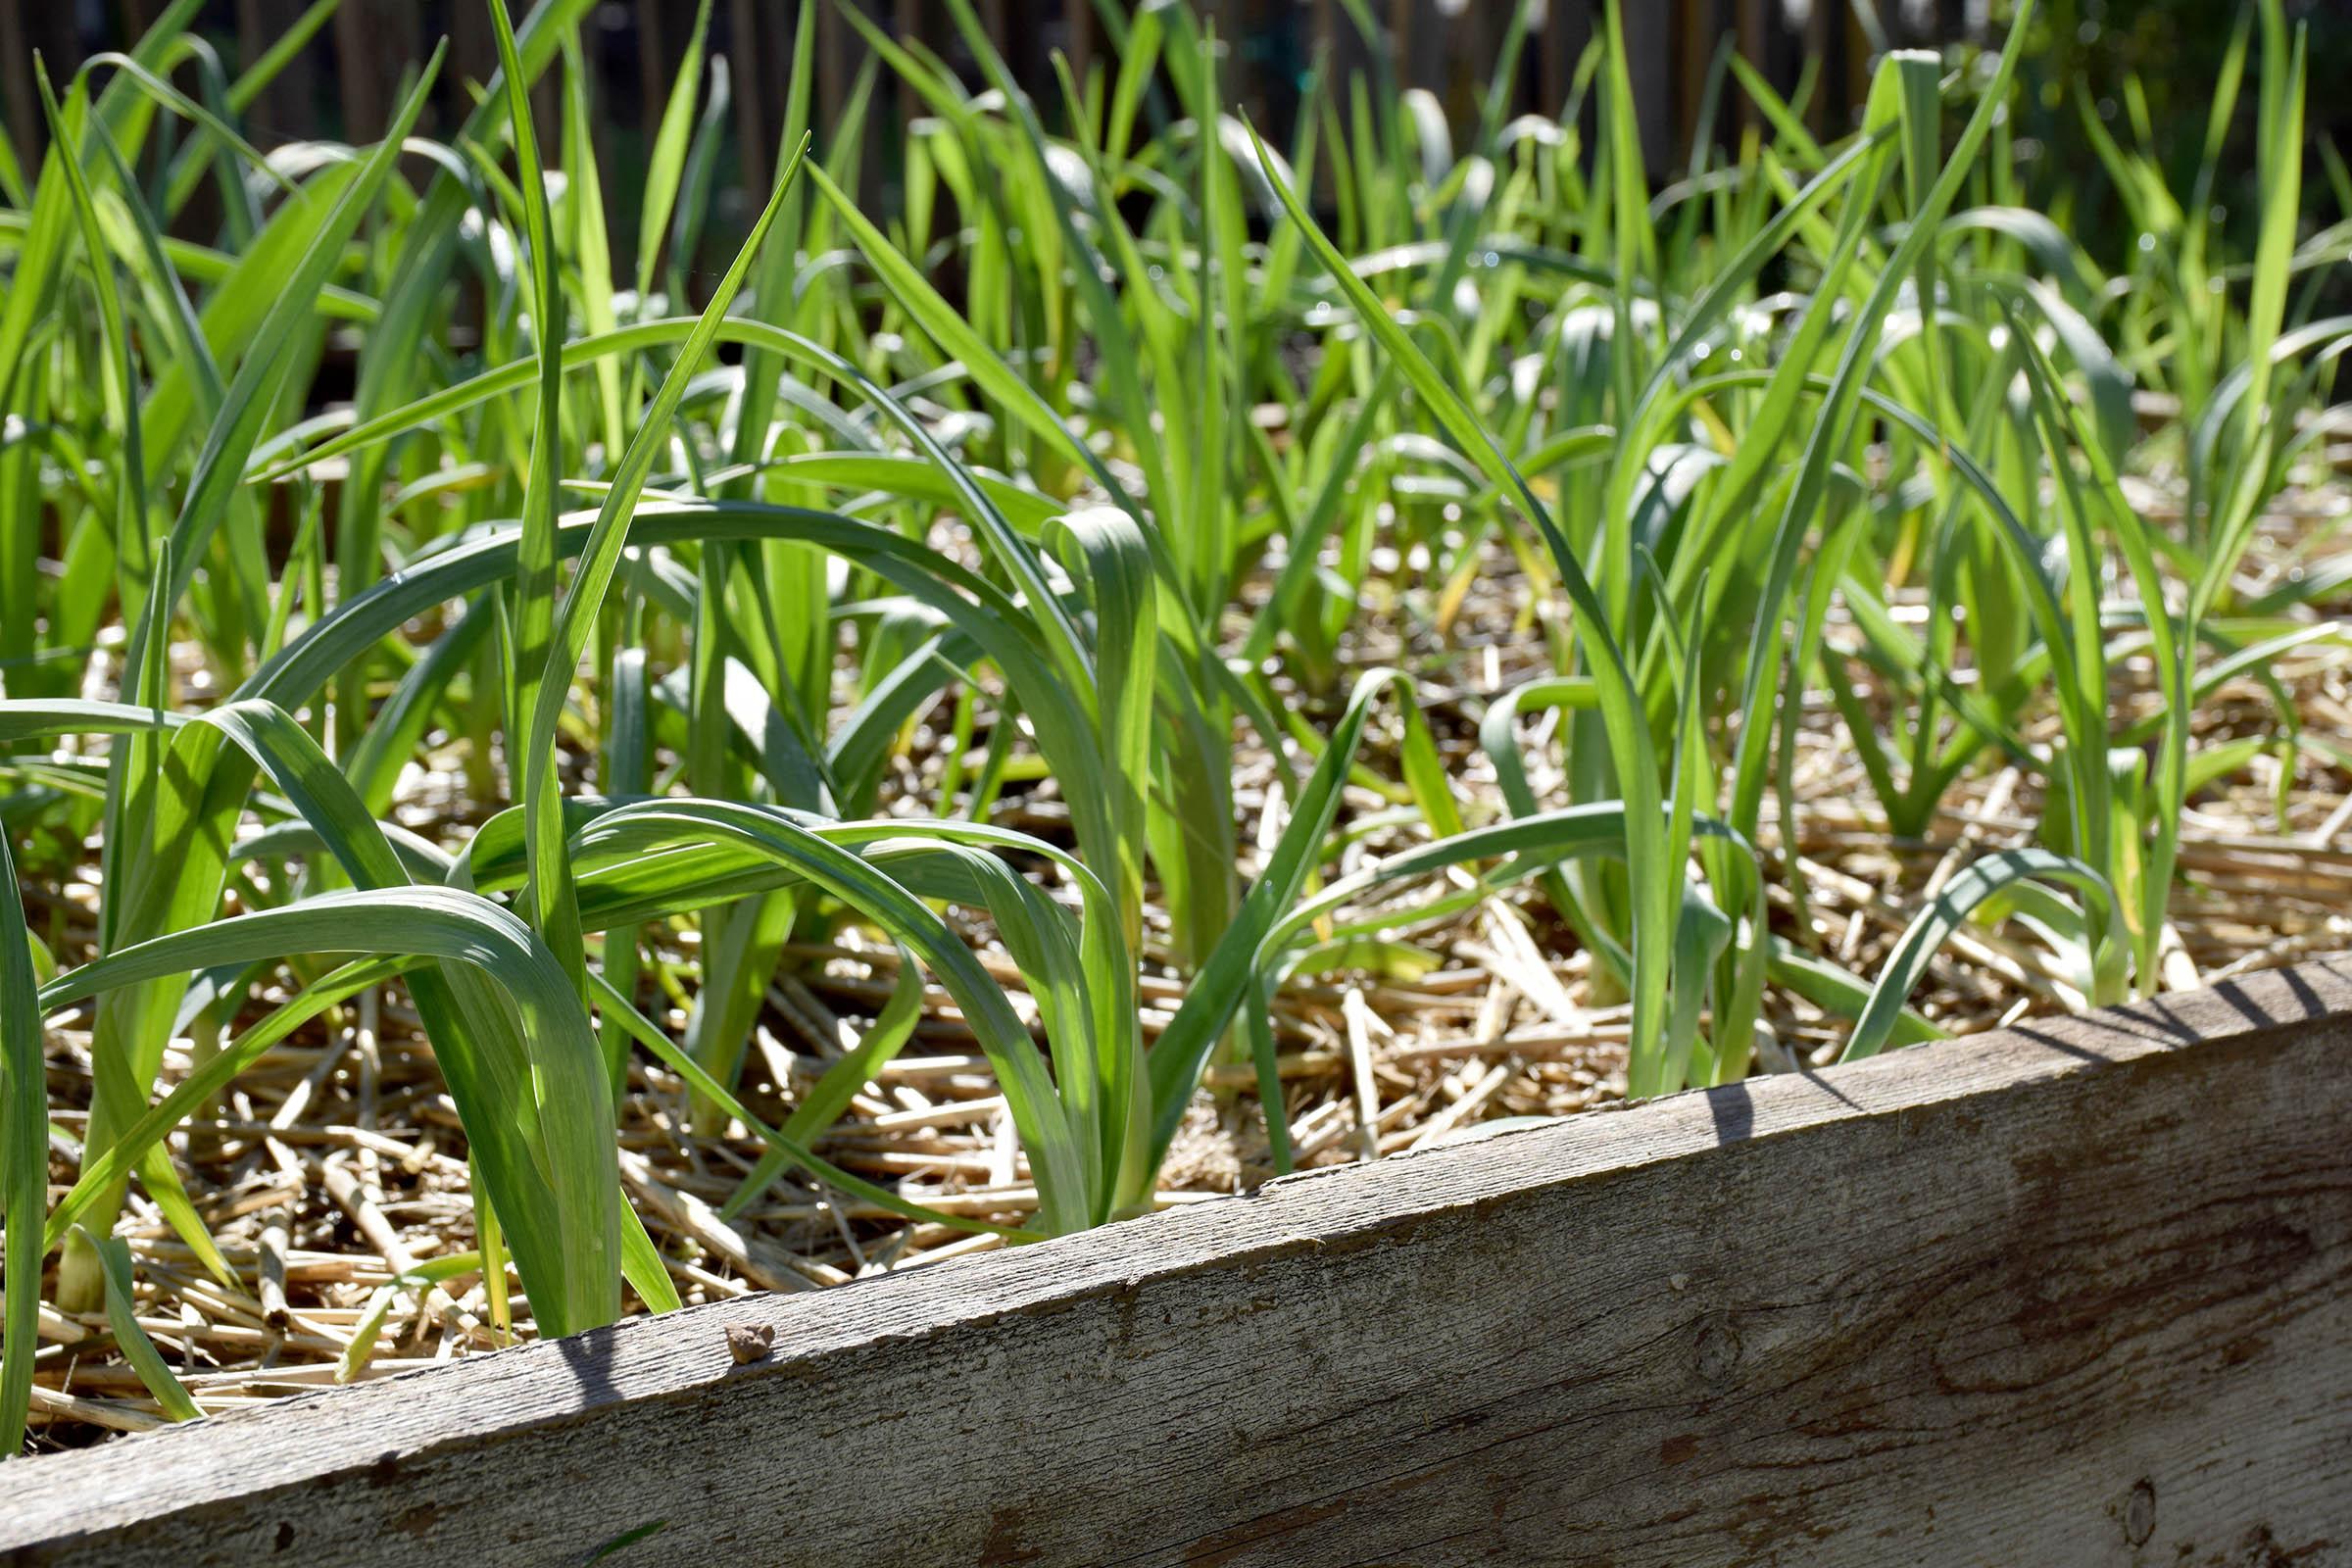 garlic_bed.jpg